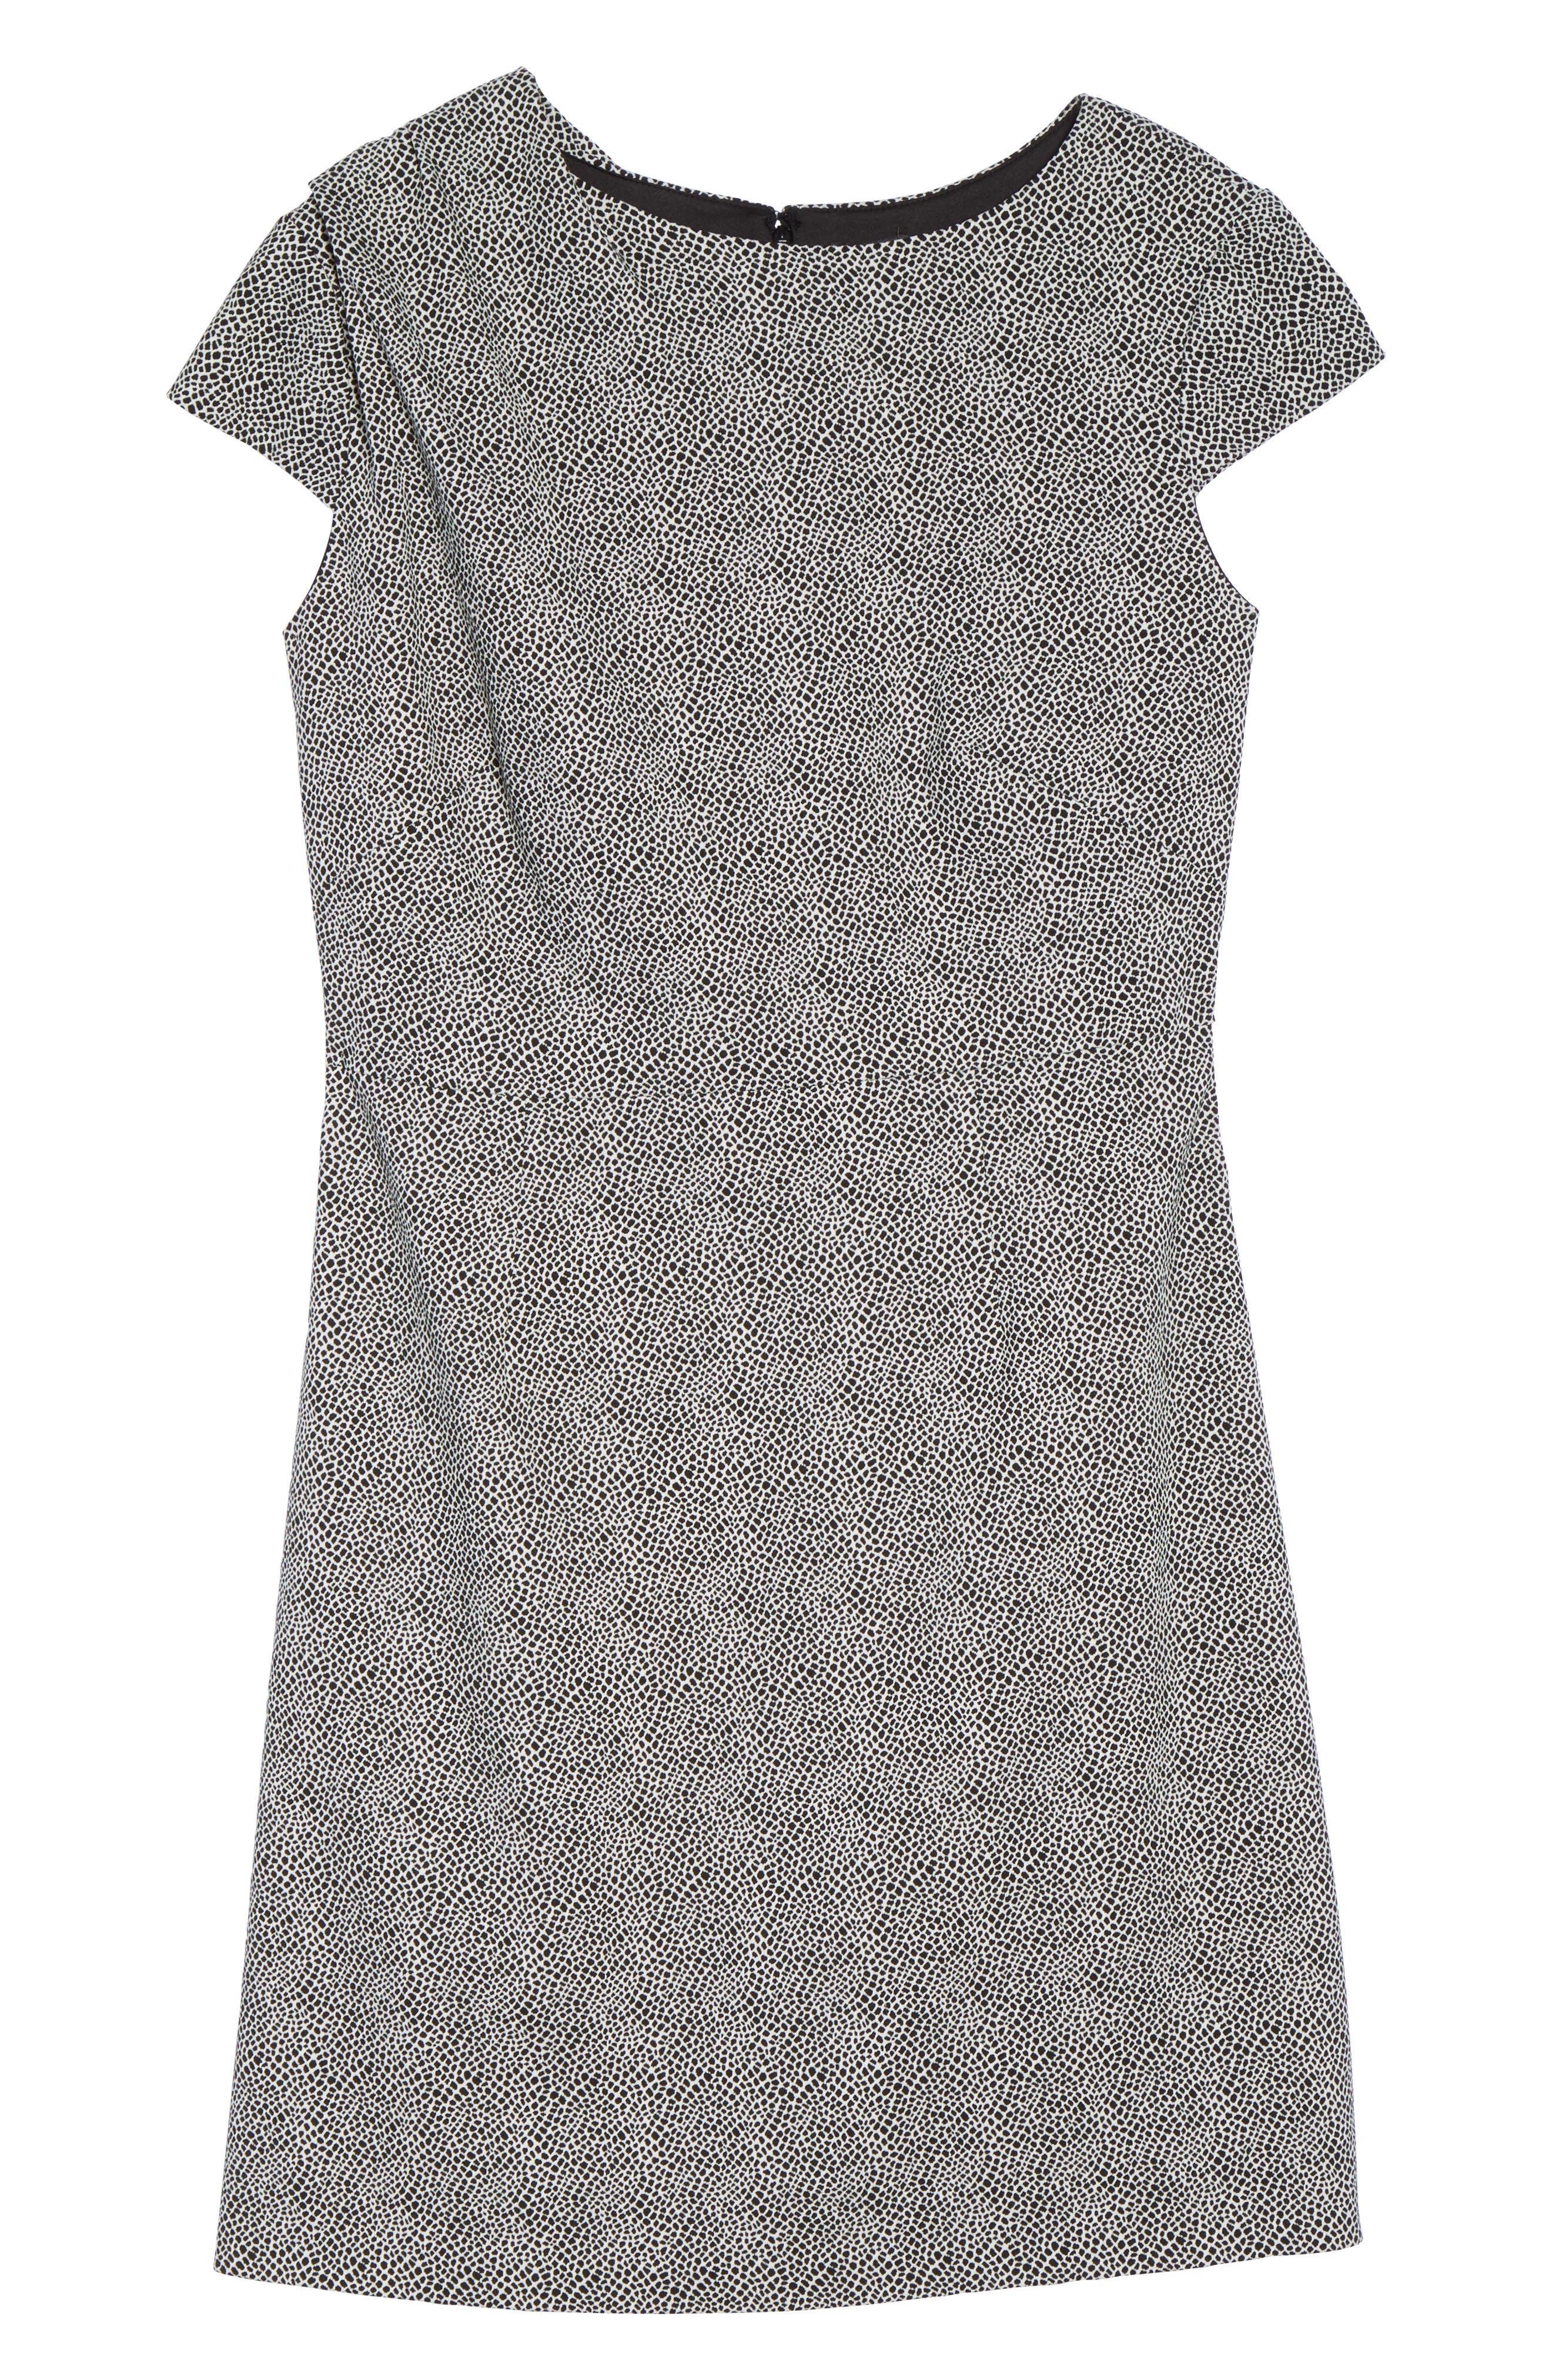 Spotted Jacquard Fit & Flare Dress,                             Alternate thumbnail 6, color,                             001